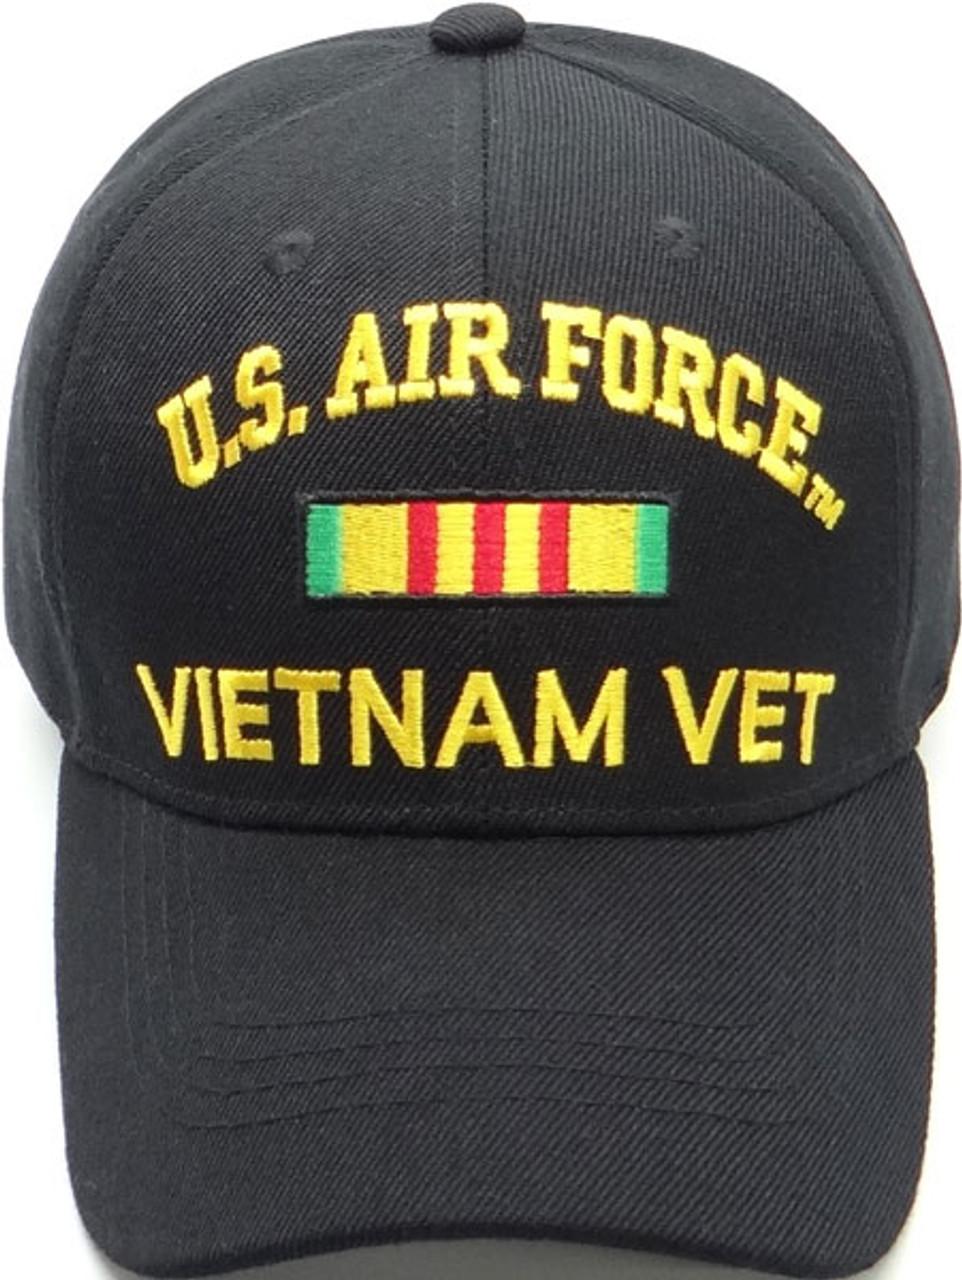 U.S ARMY hat cap ARMY Vietnam Veteran Official Licensed Baseball cap Black